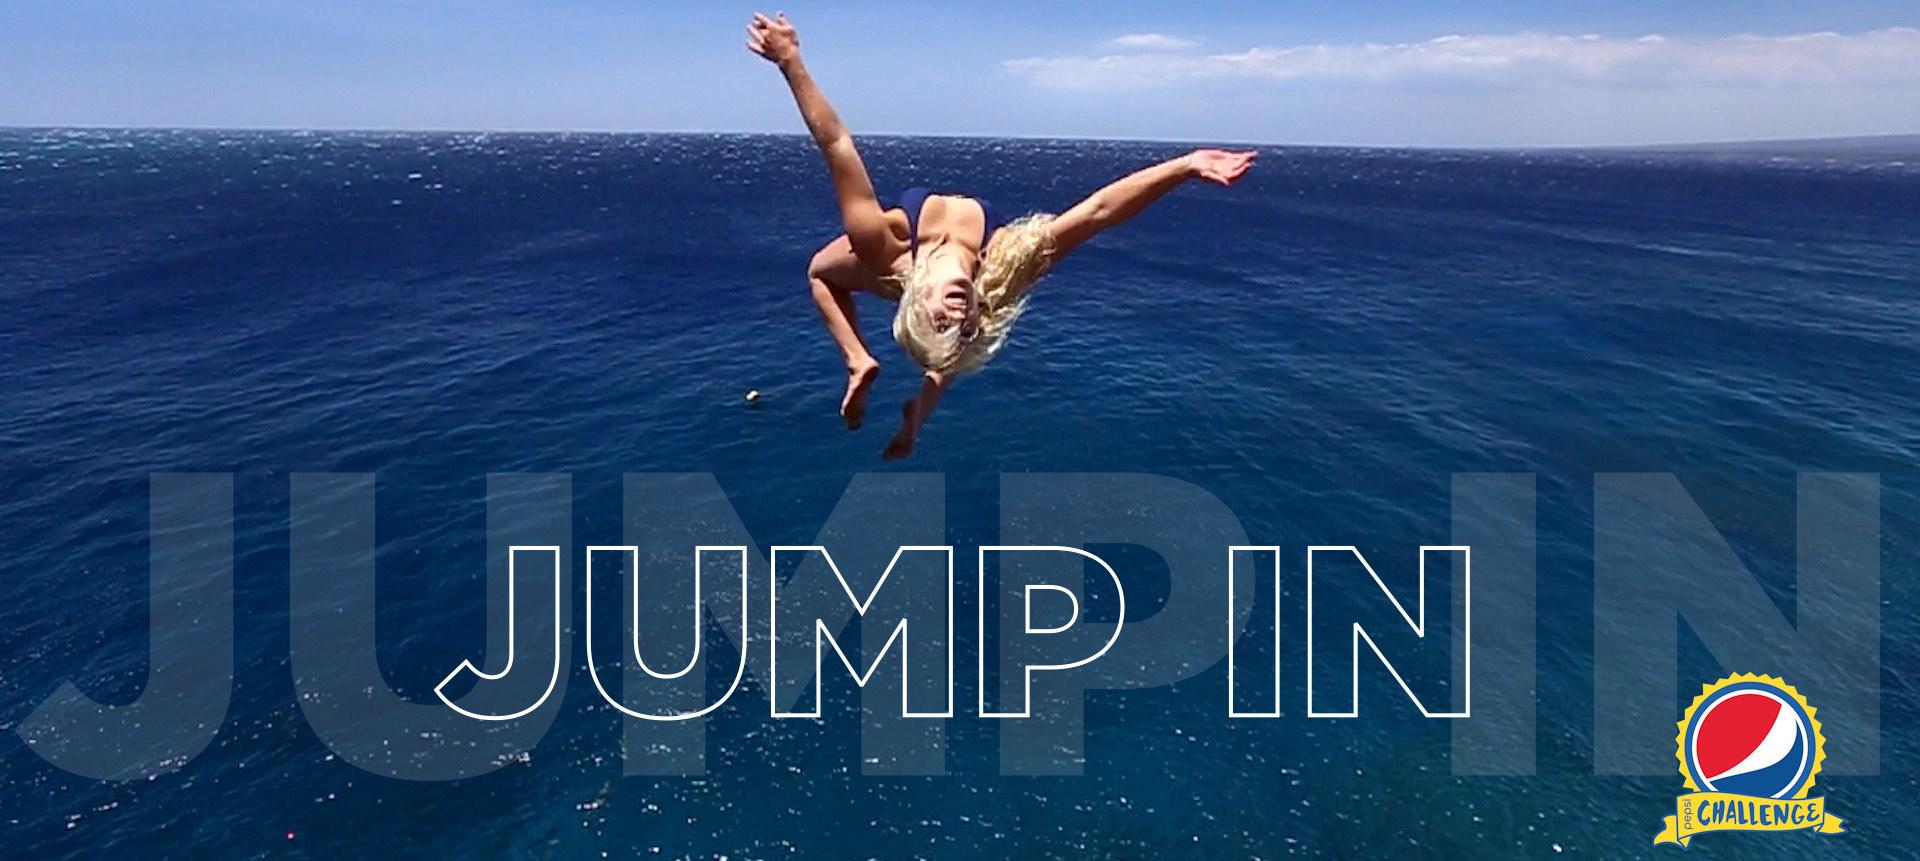 pepsi challenge jump